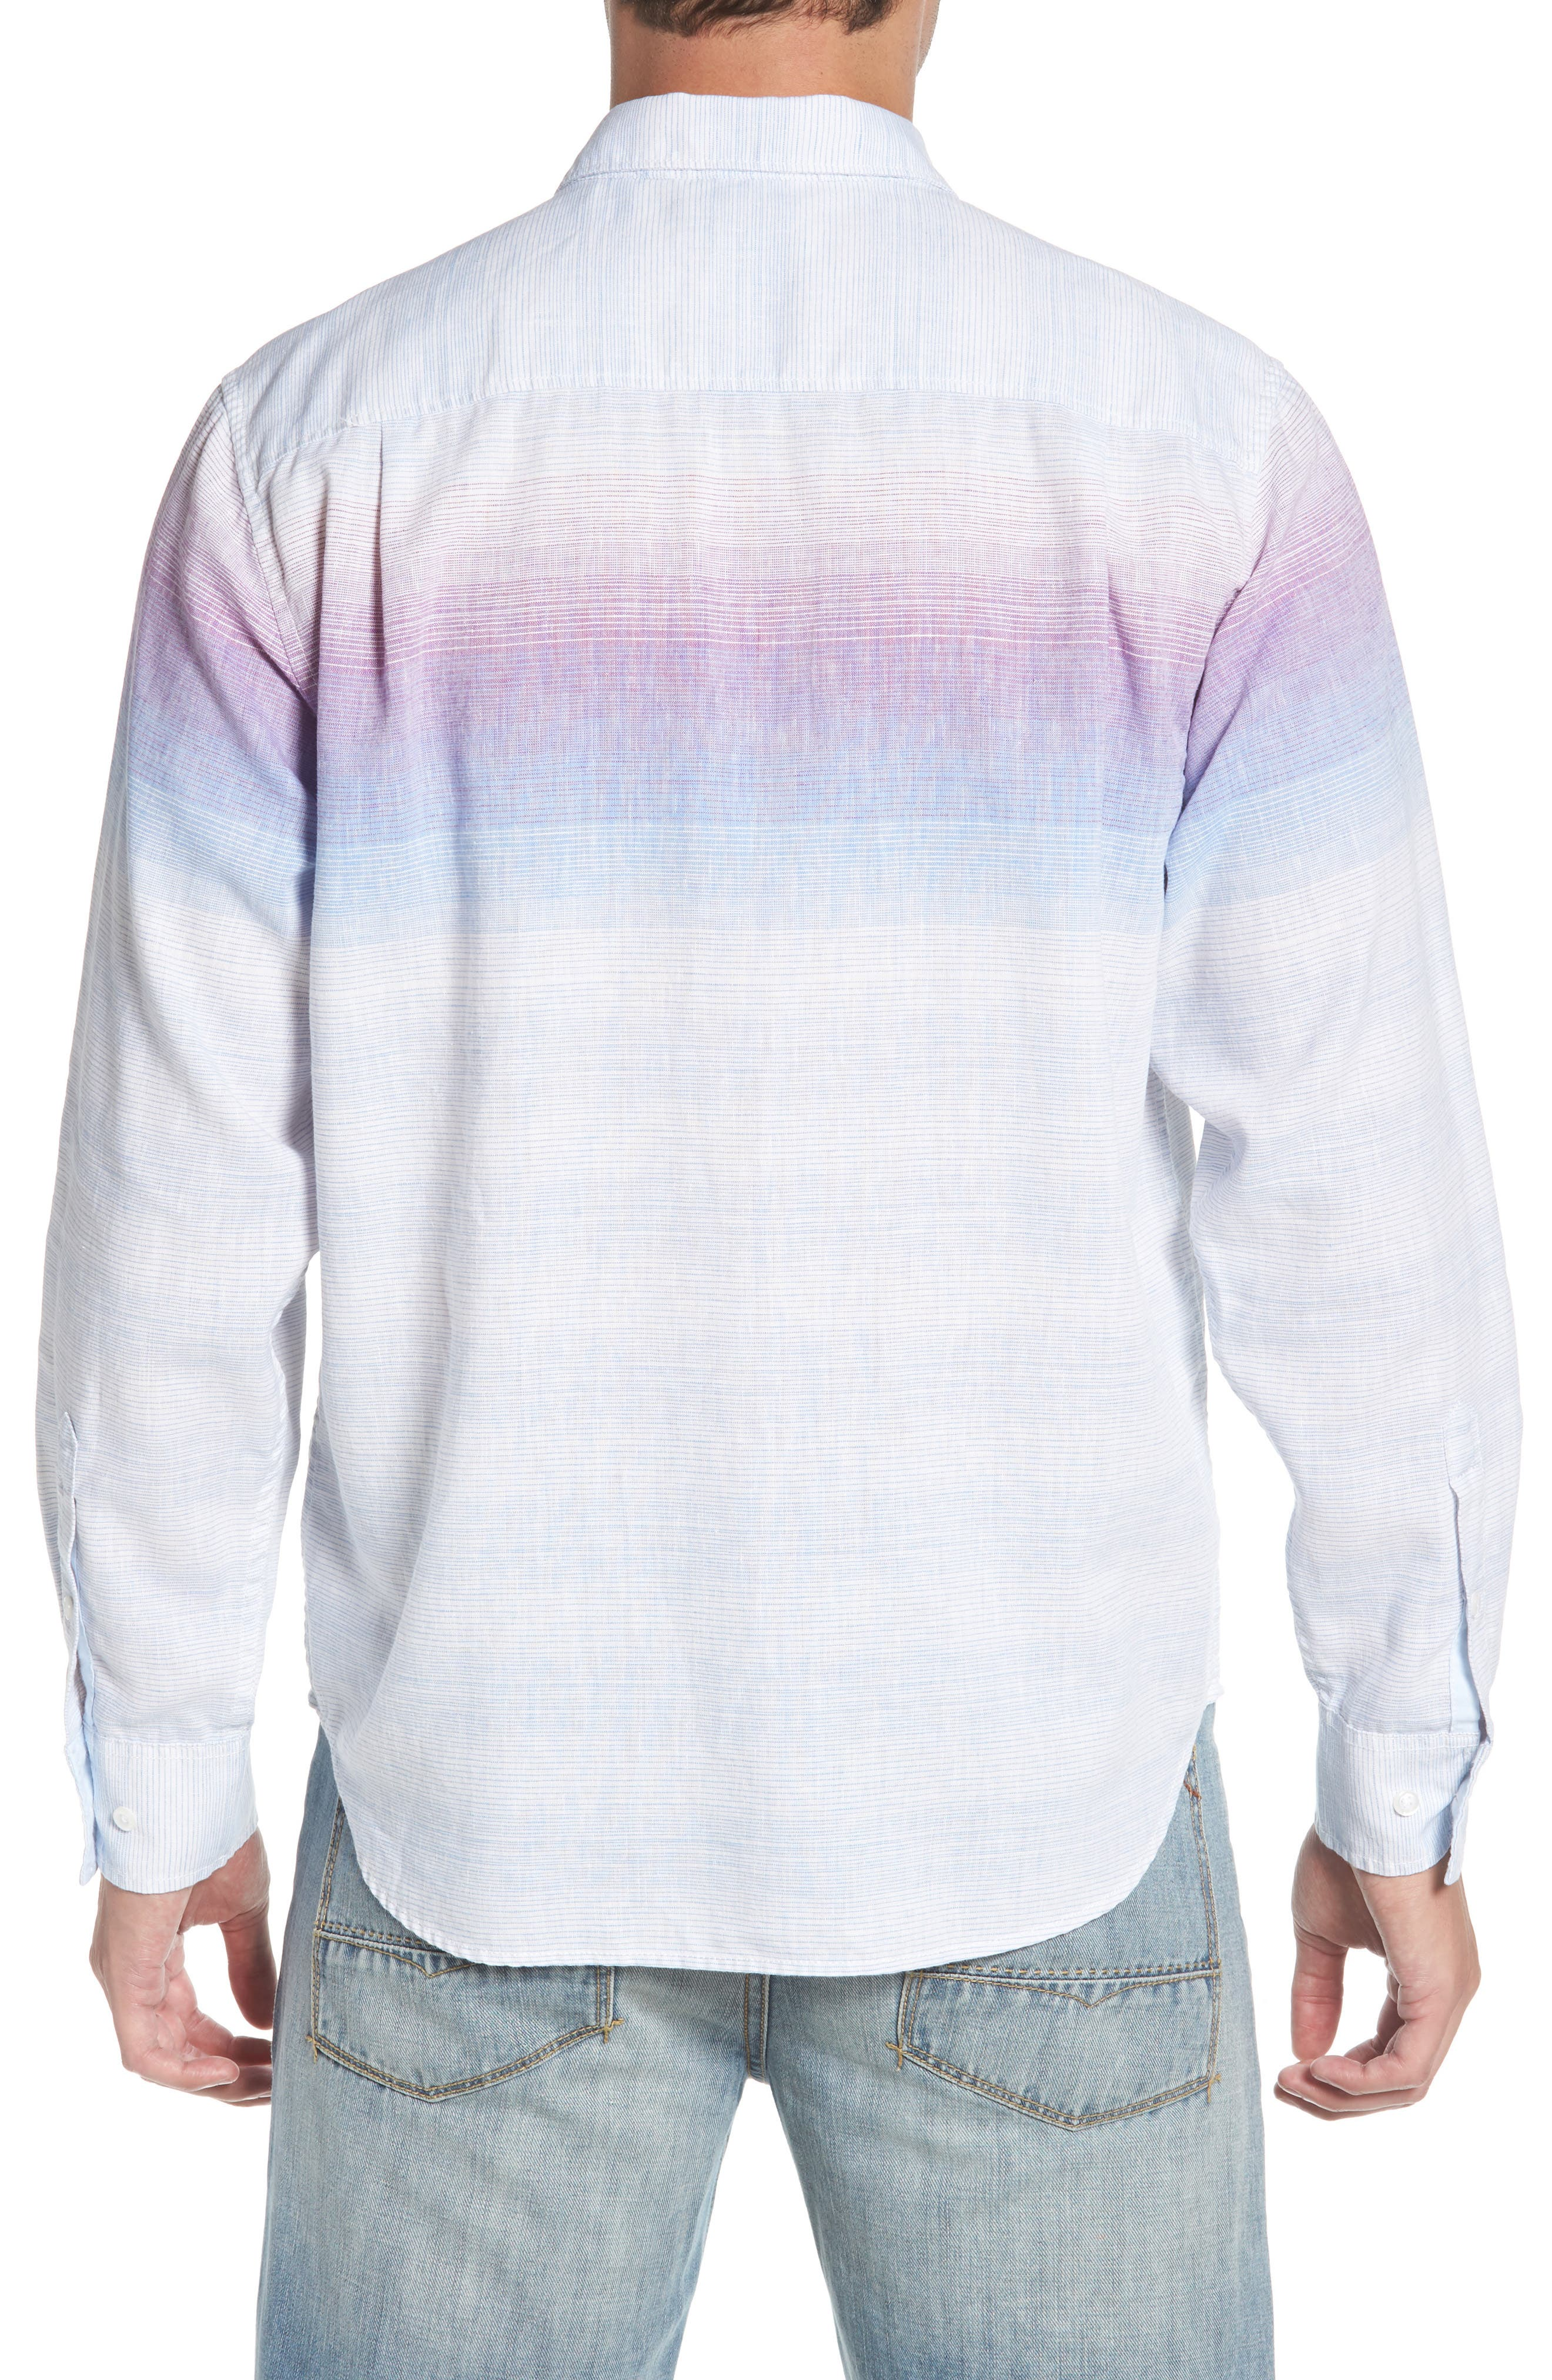 Sunset Ombré Linen Blend Sport Shirt,                             Alternate thumbnail 2, color,                             100